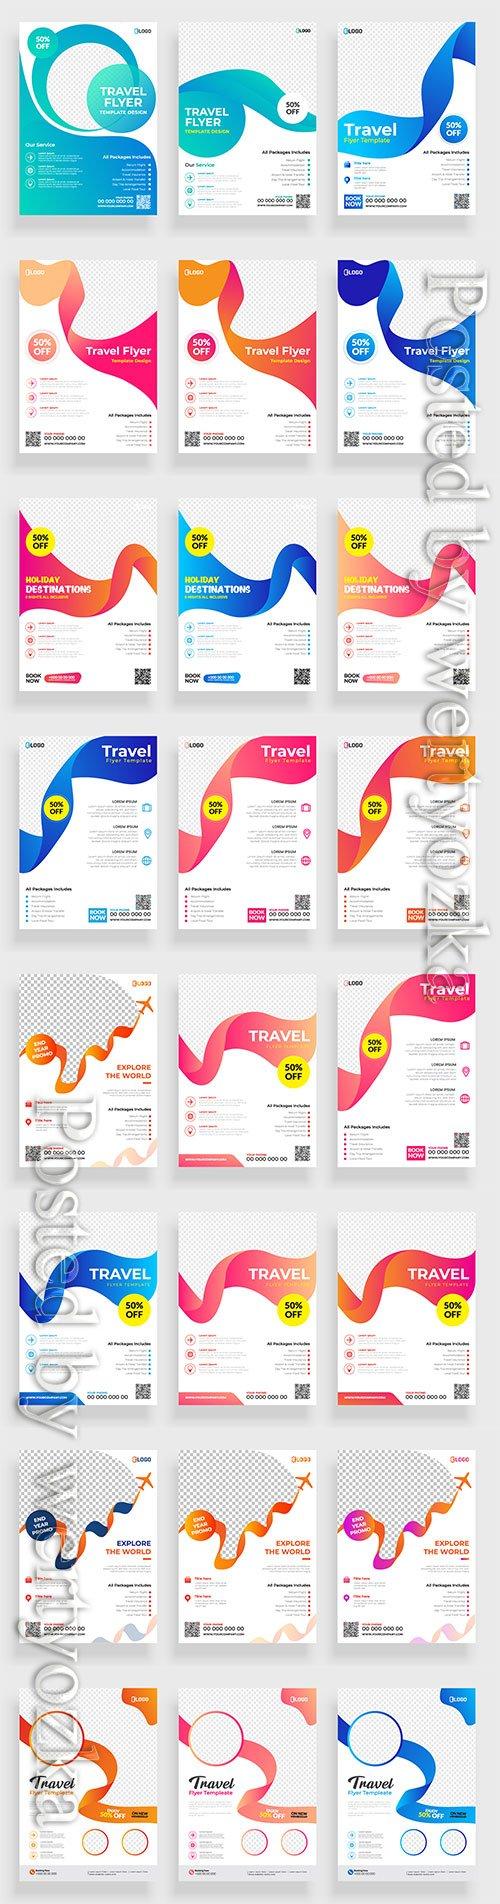 Business flyer template design, brochure vector illustration # 10